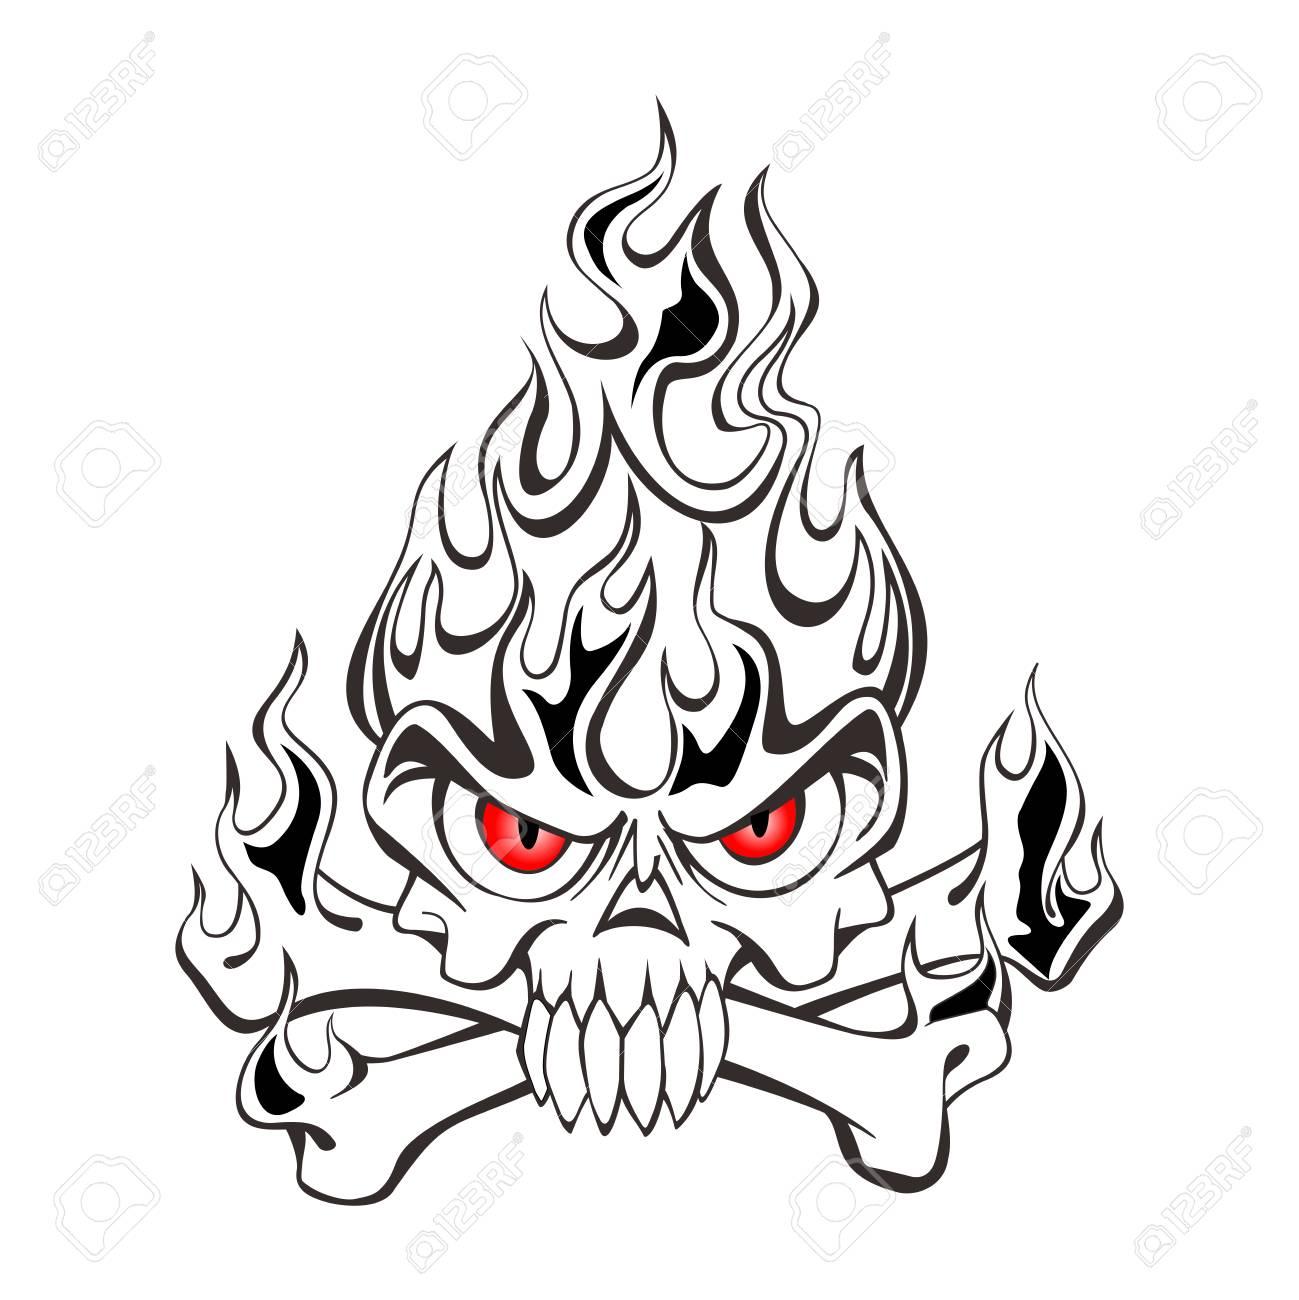 1299x1300 Vector Black And White Tribal Skull On Fire Tattoo Illustration